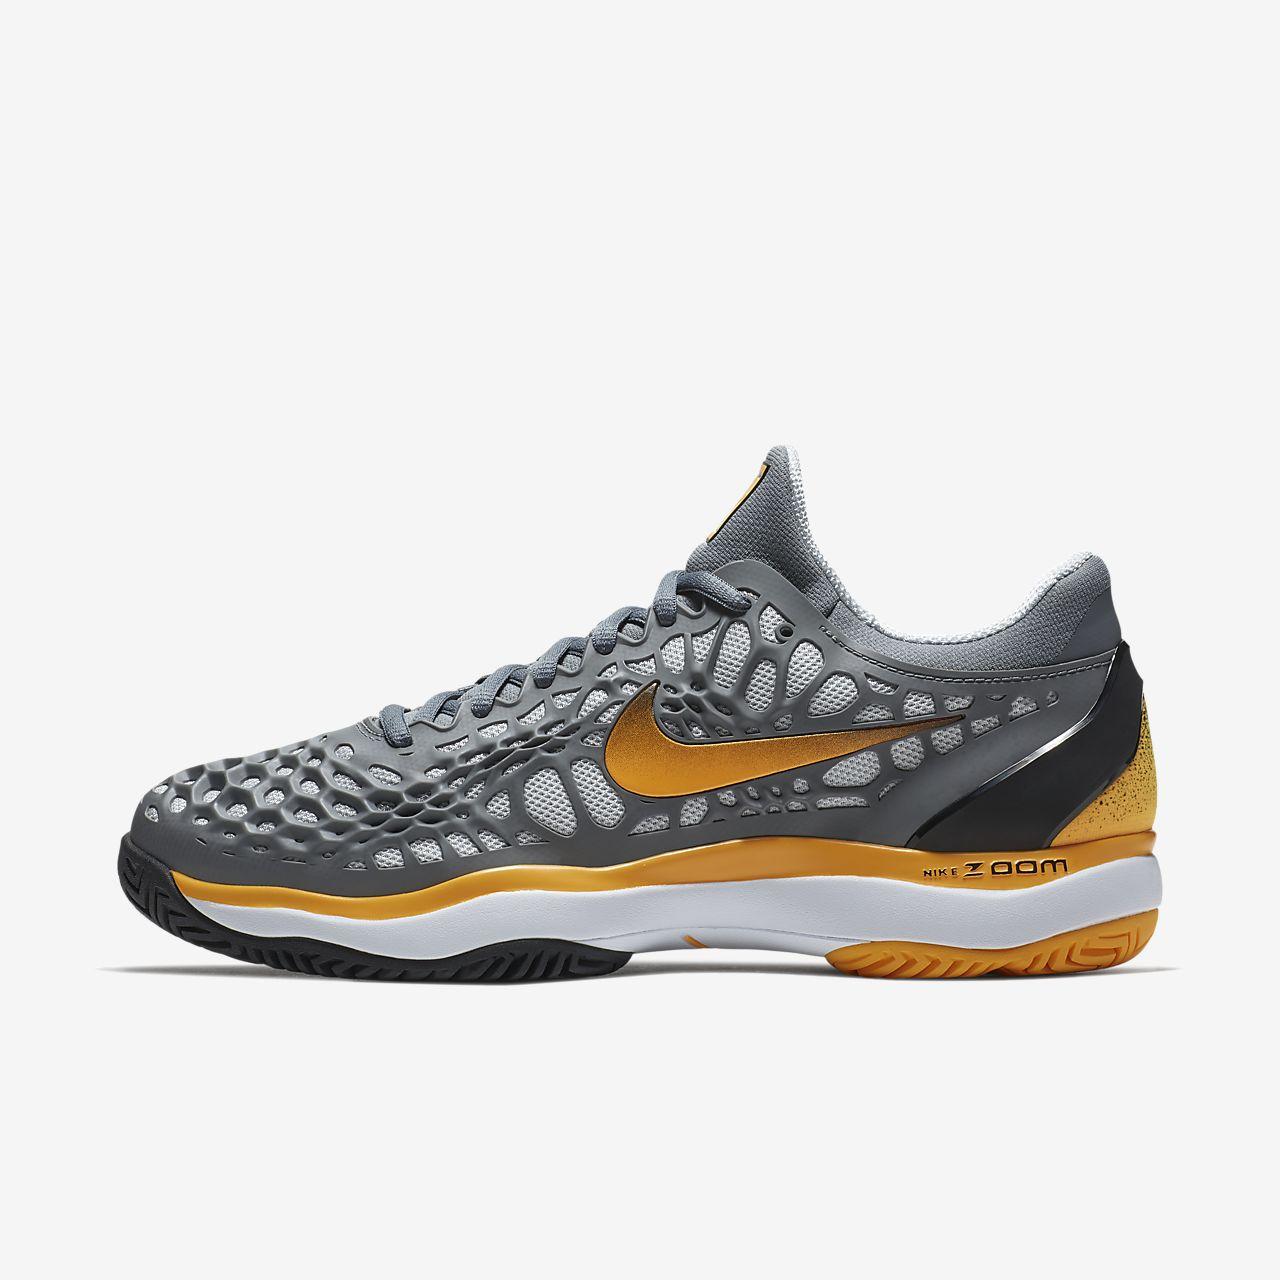 B Nike Hommes Zoom Cage 3 Clay Hommes Nike Chaussure de tennis gris Orange EU 45 2466d4